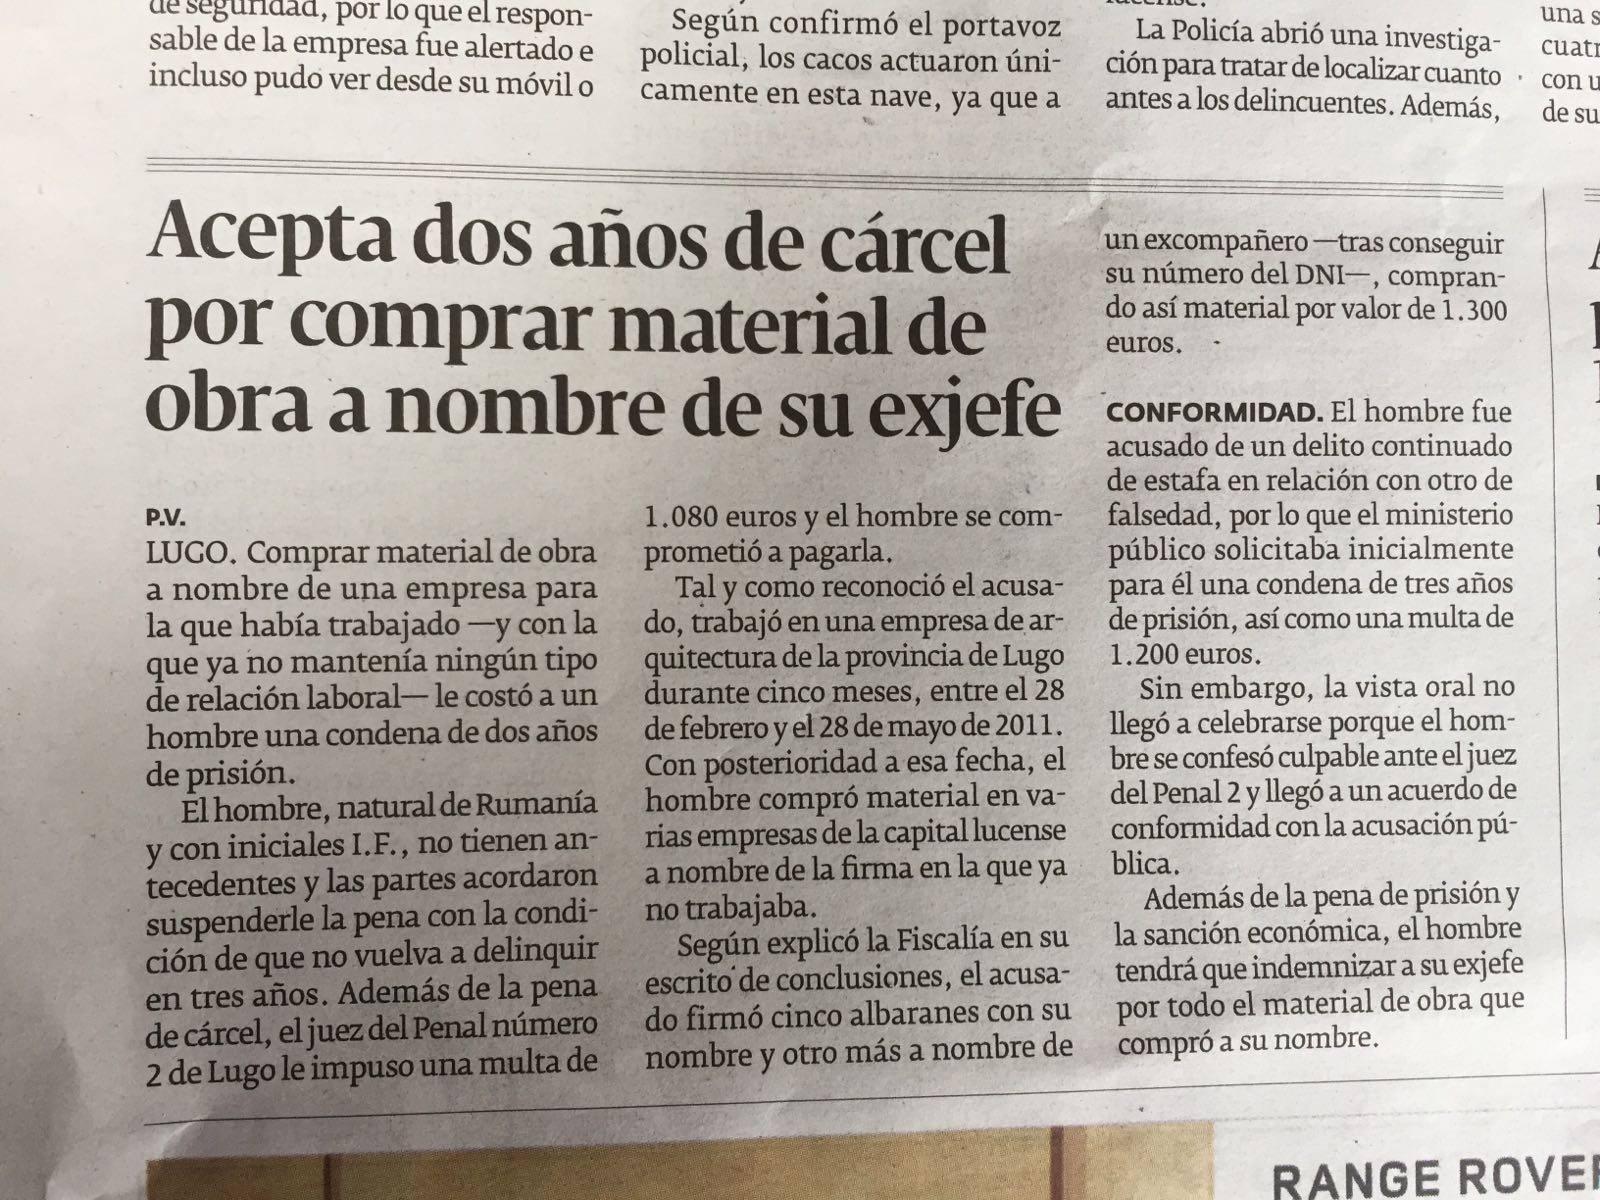 articol-presa-spania-roman